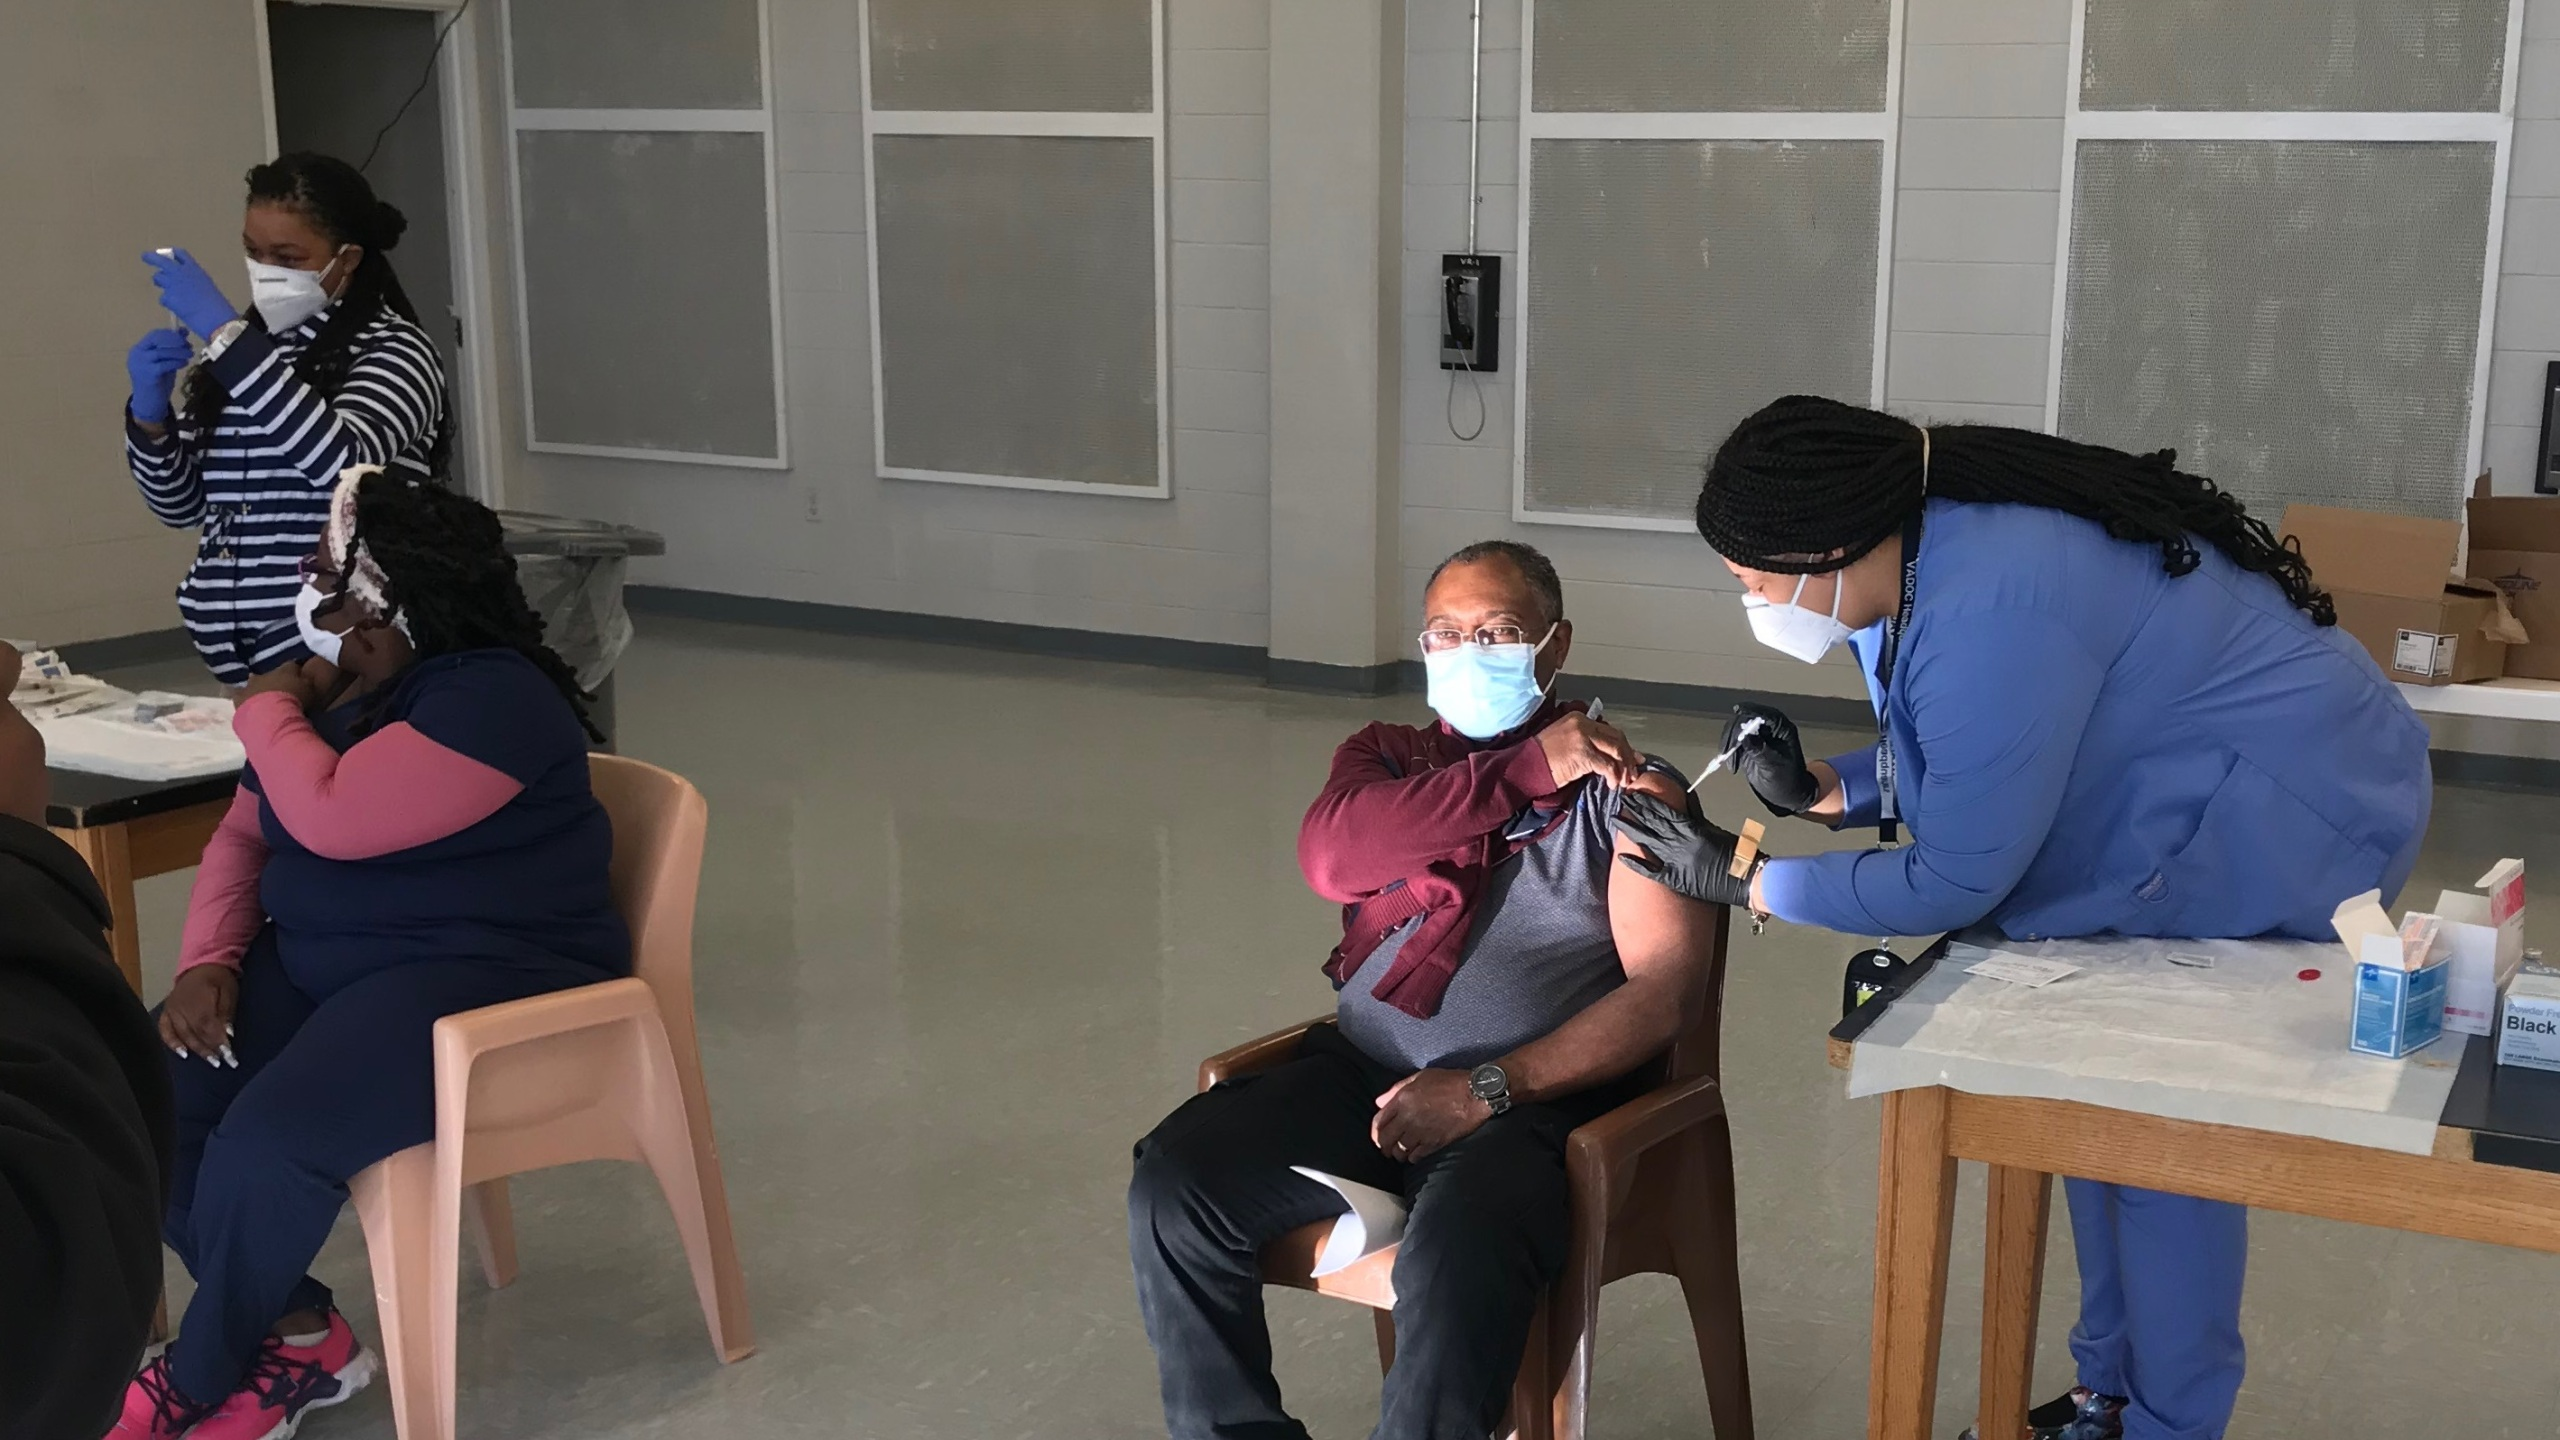 vaccinating staff